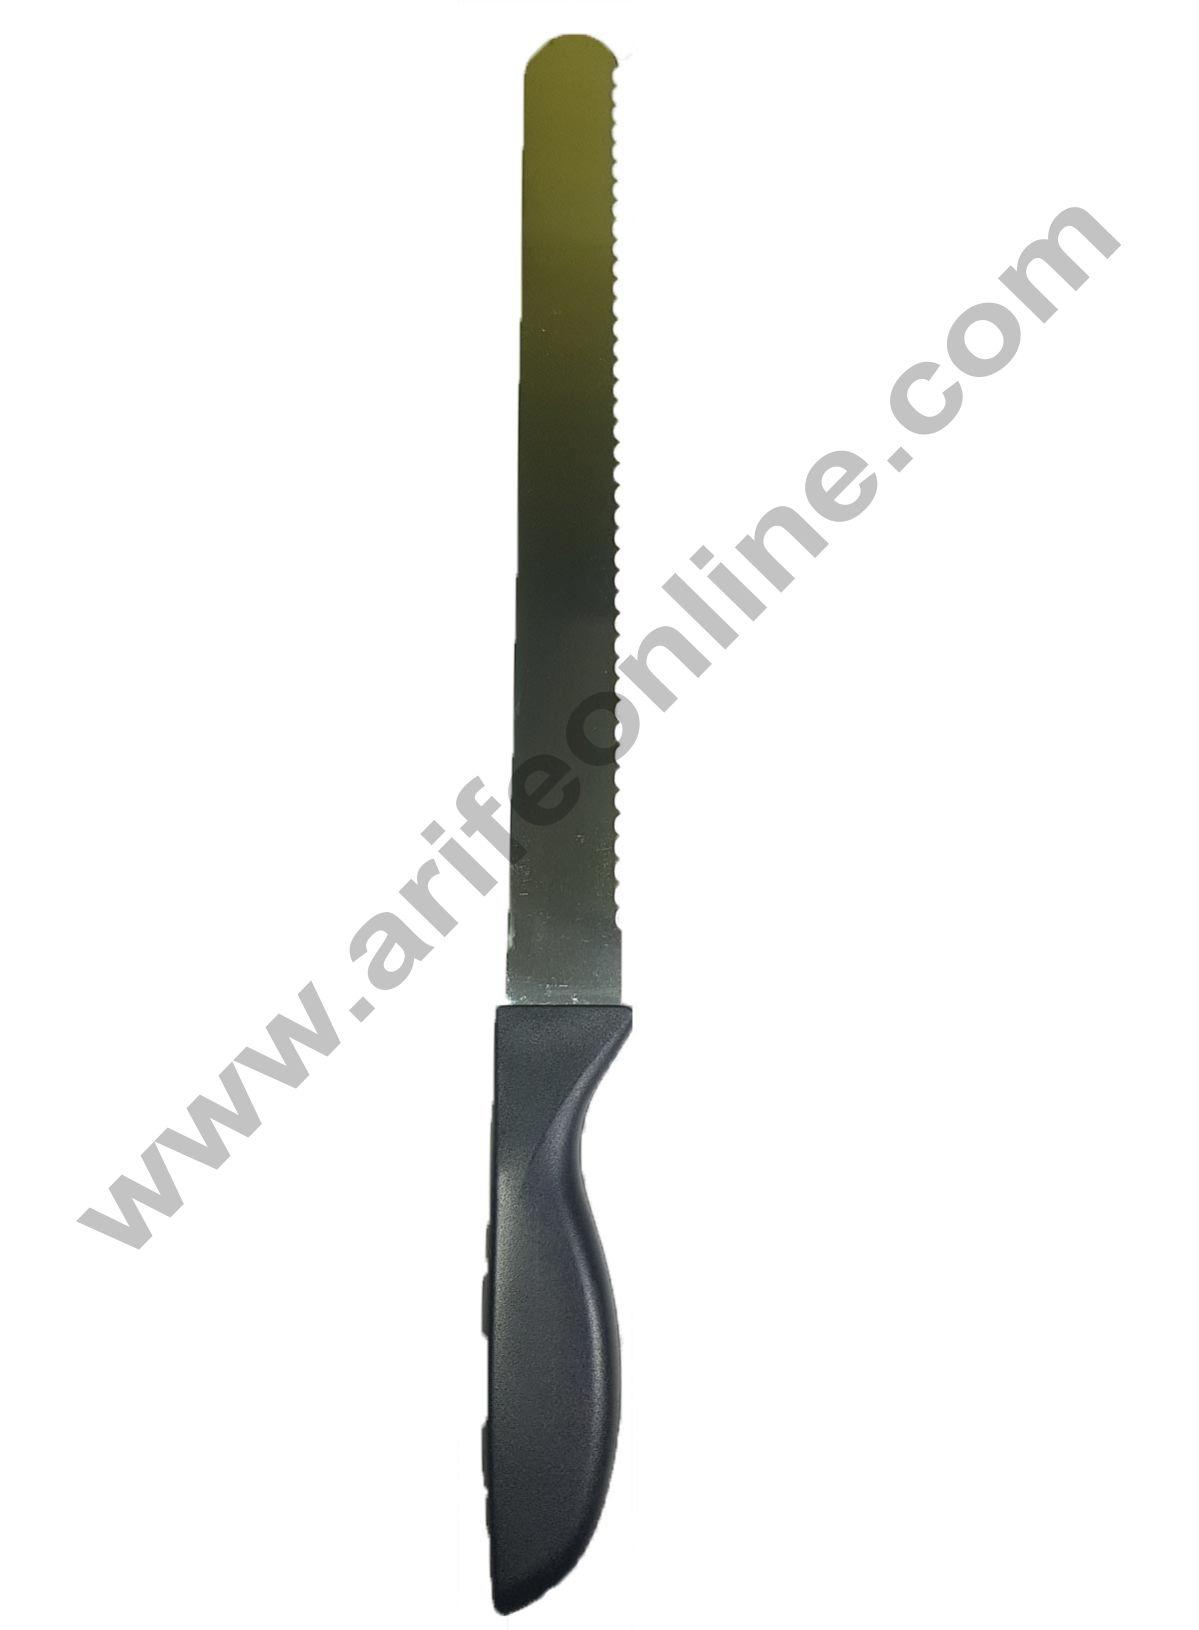 Cake Decor Straight Spatula Sawtooth Shape Knife,Combo Cake Pallate Knife-12inch/1pieces